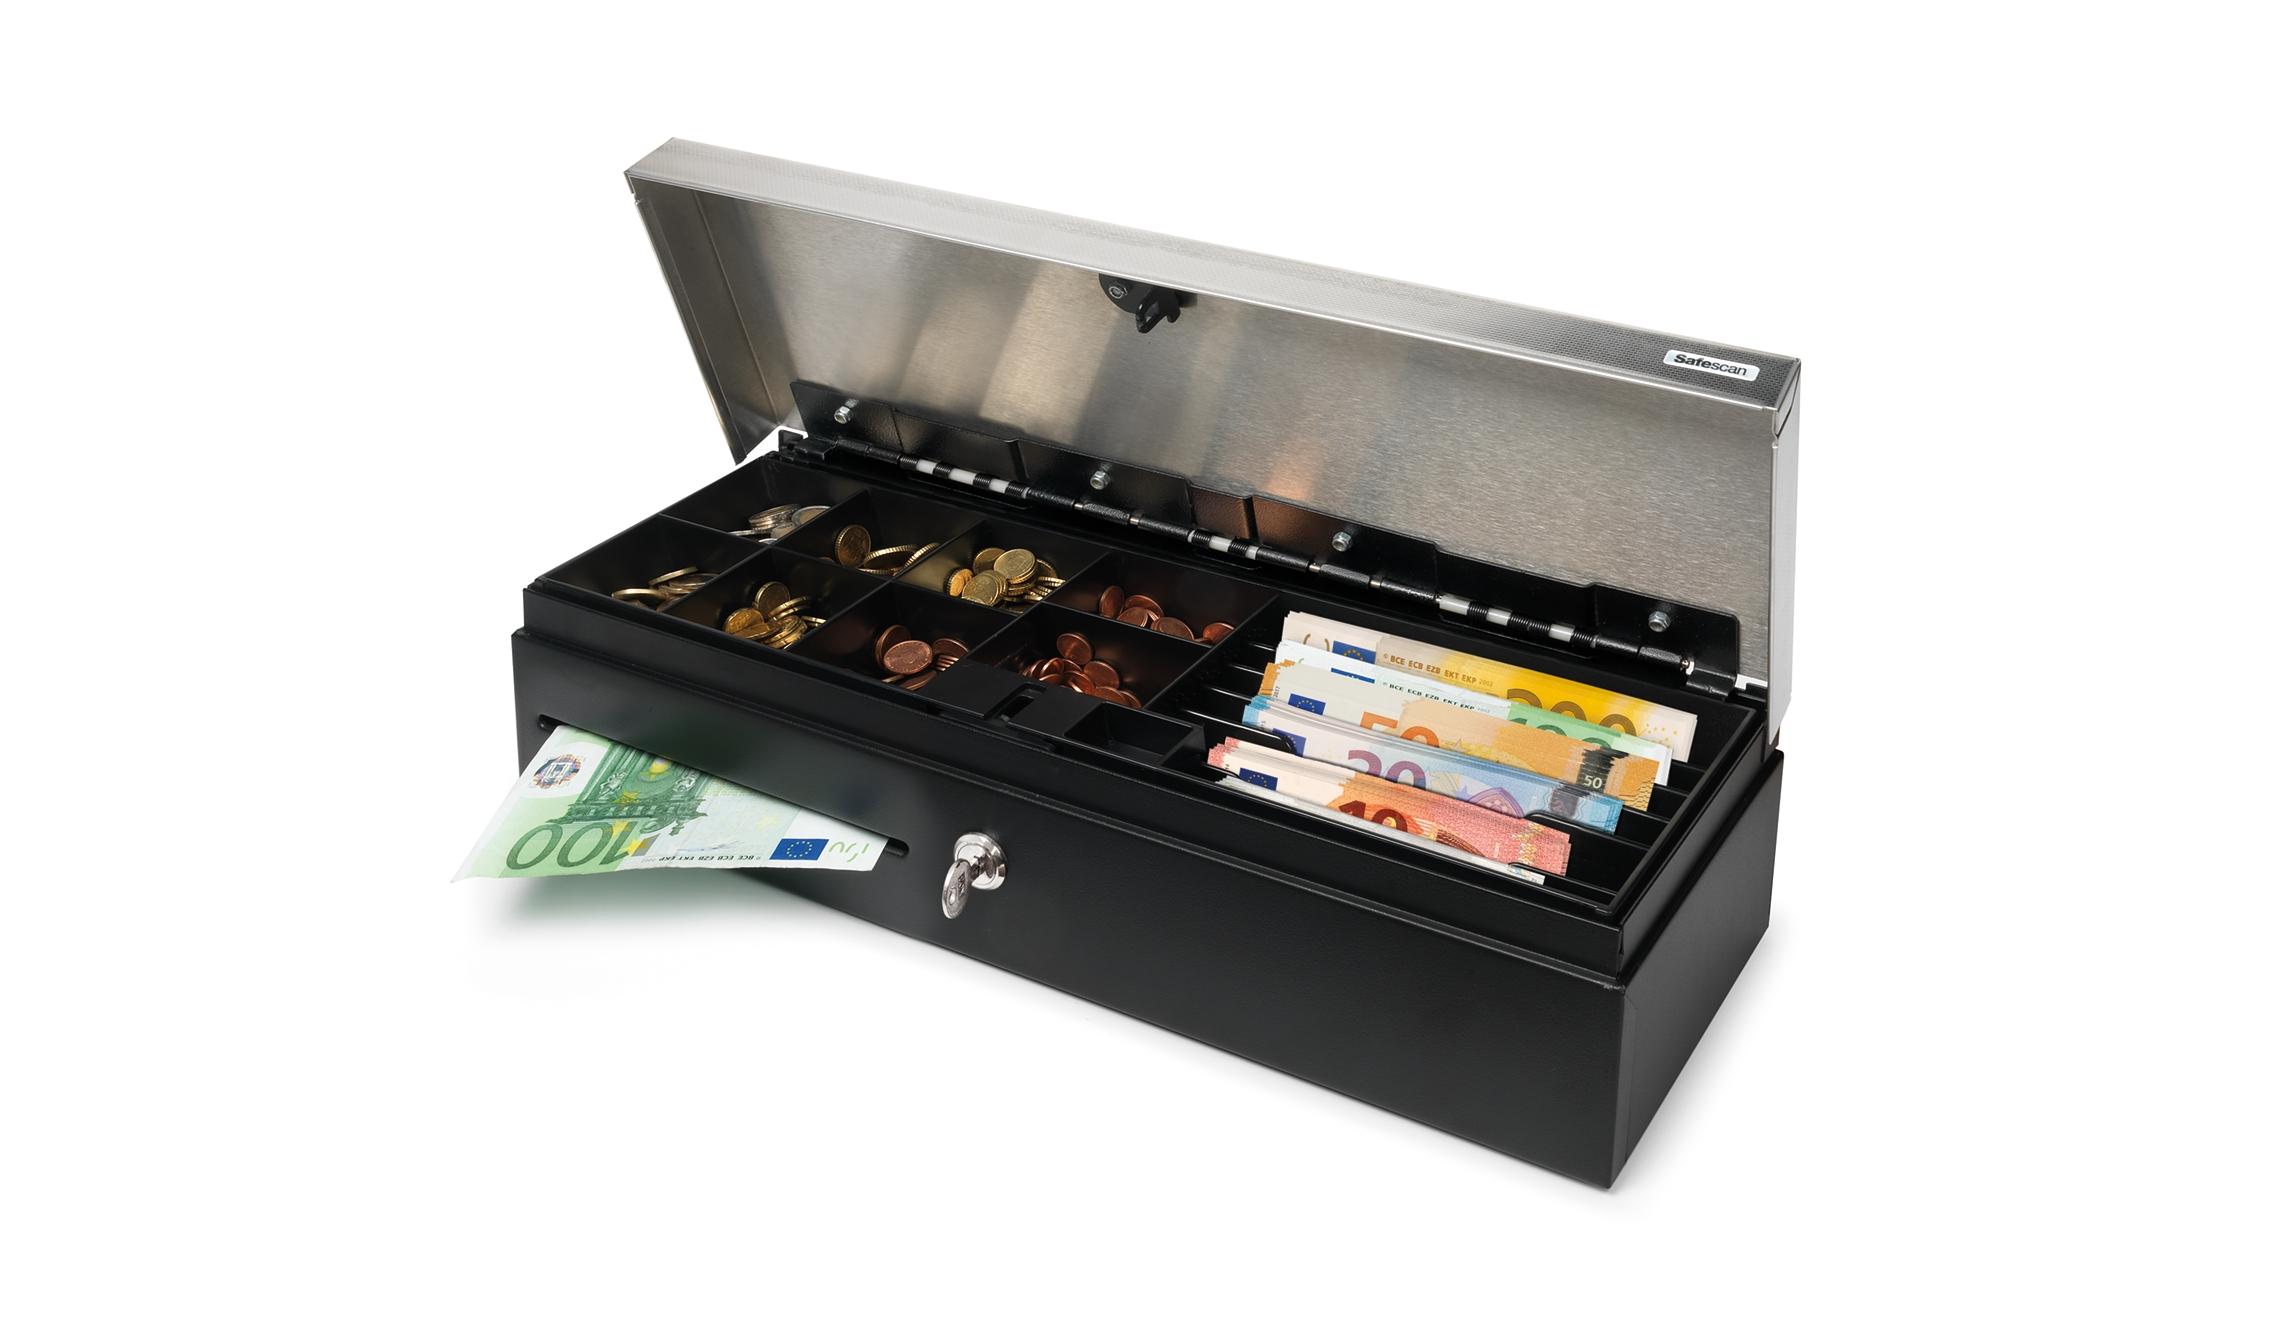 safescan-hd4617s-seperation-slot